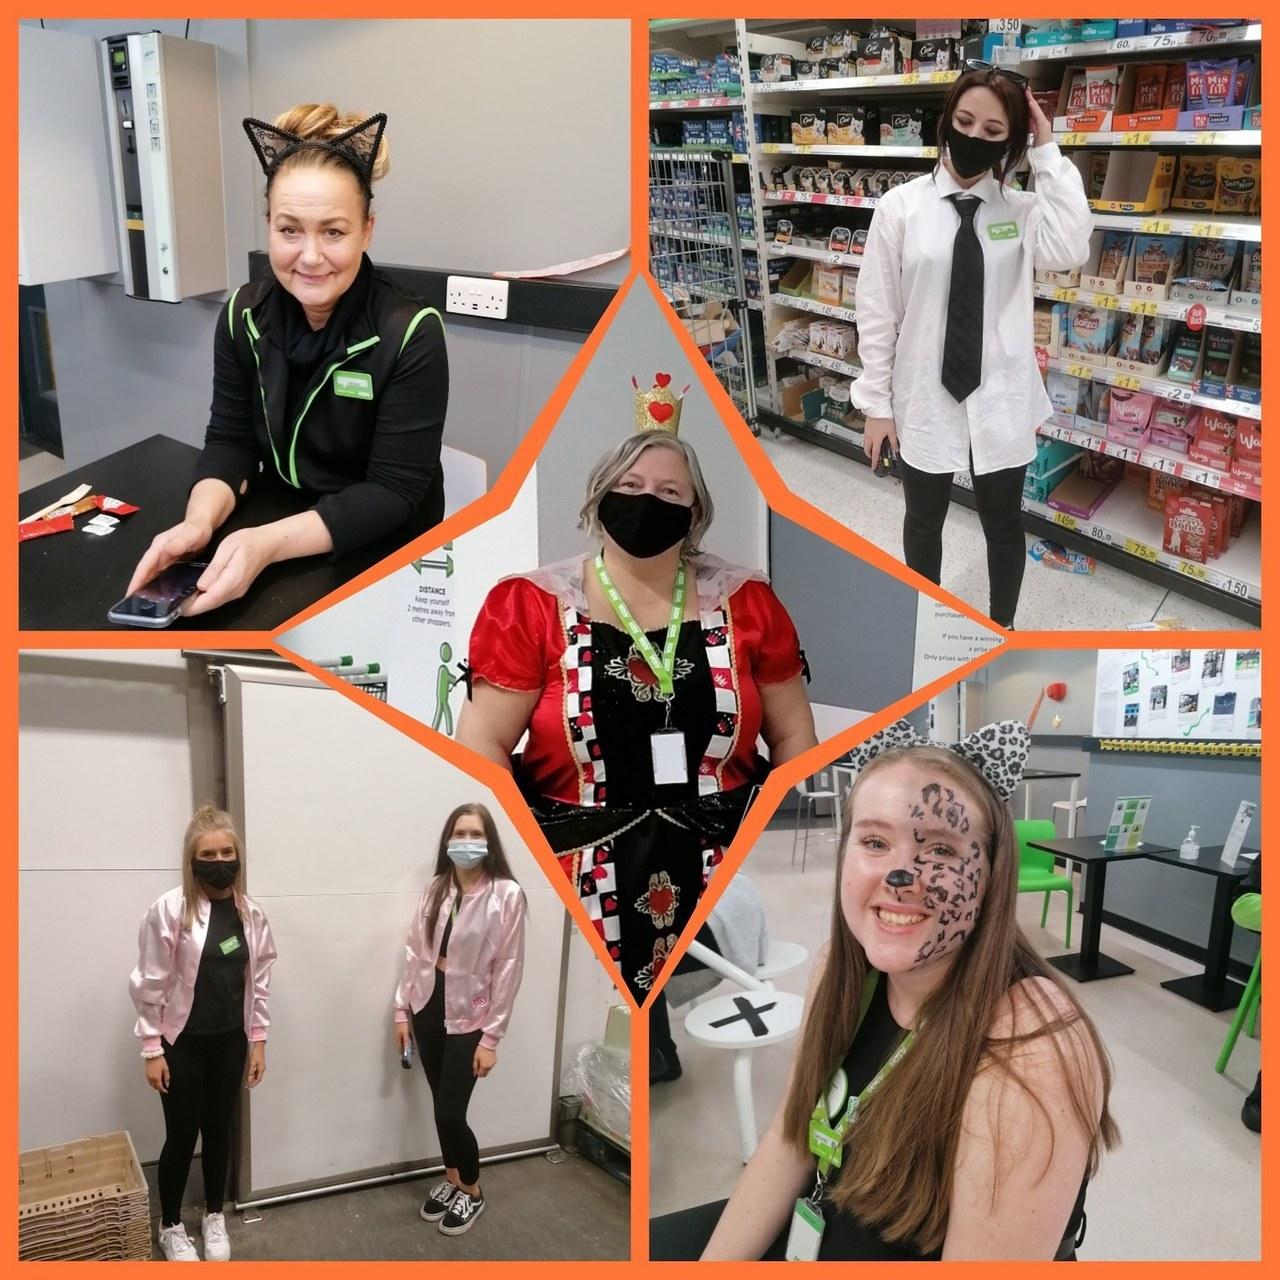 Halloween Fun at Asda Motherwell | Asda Motherwell